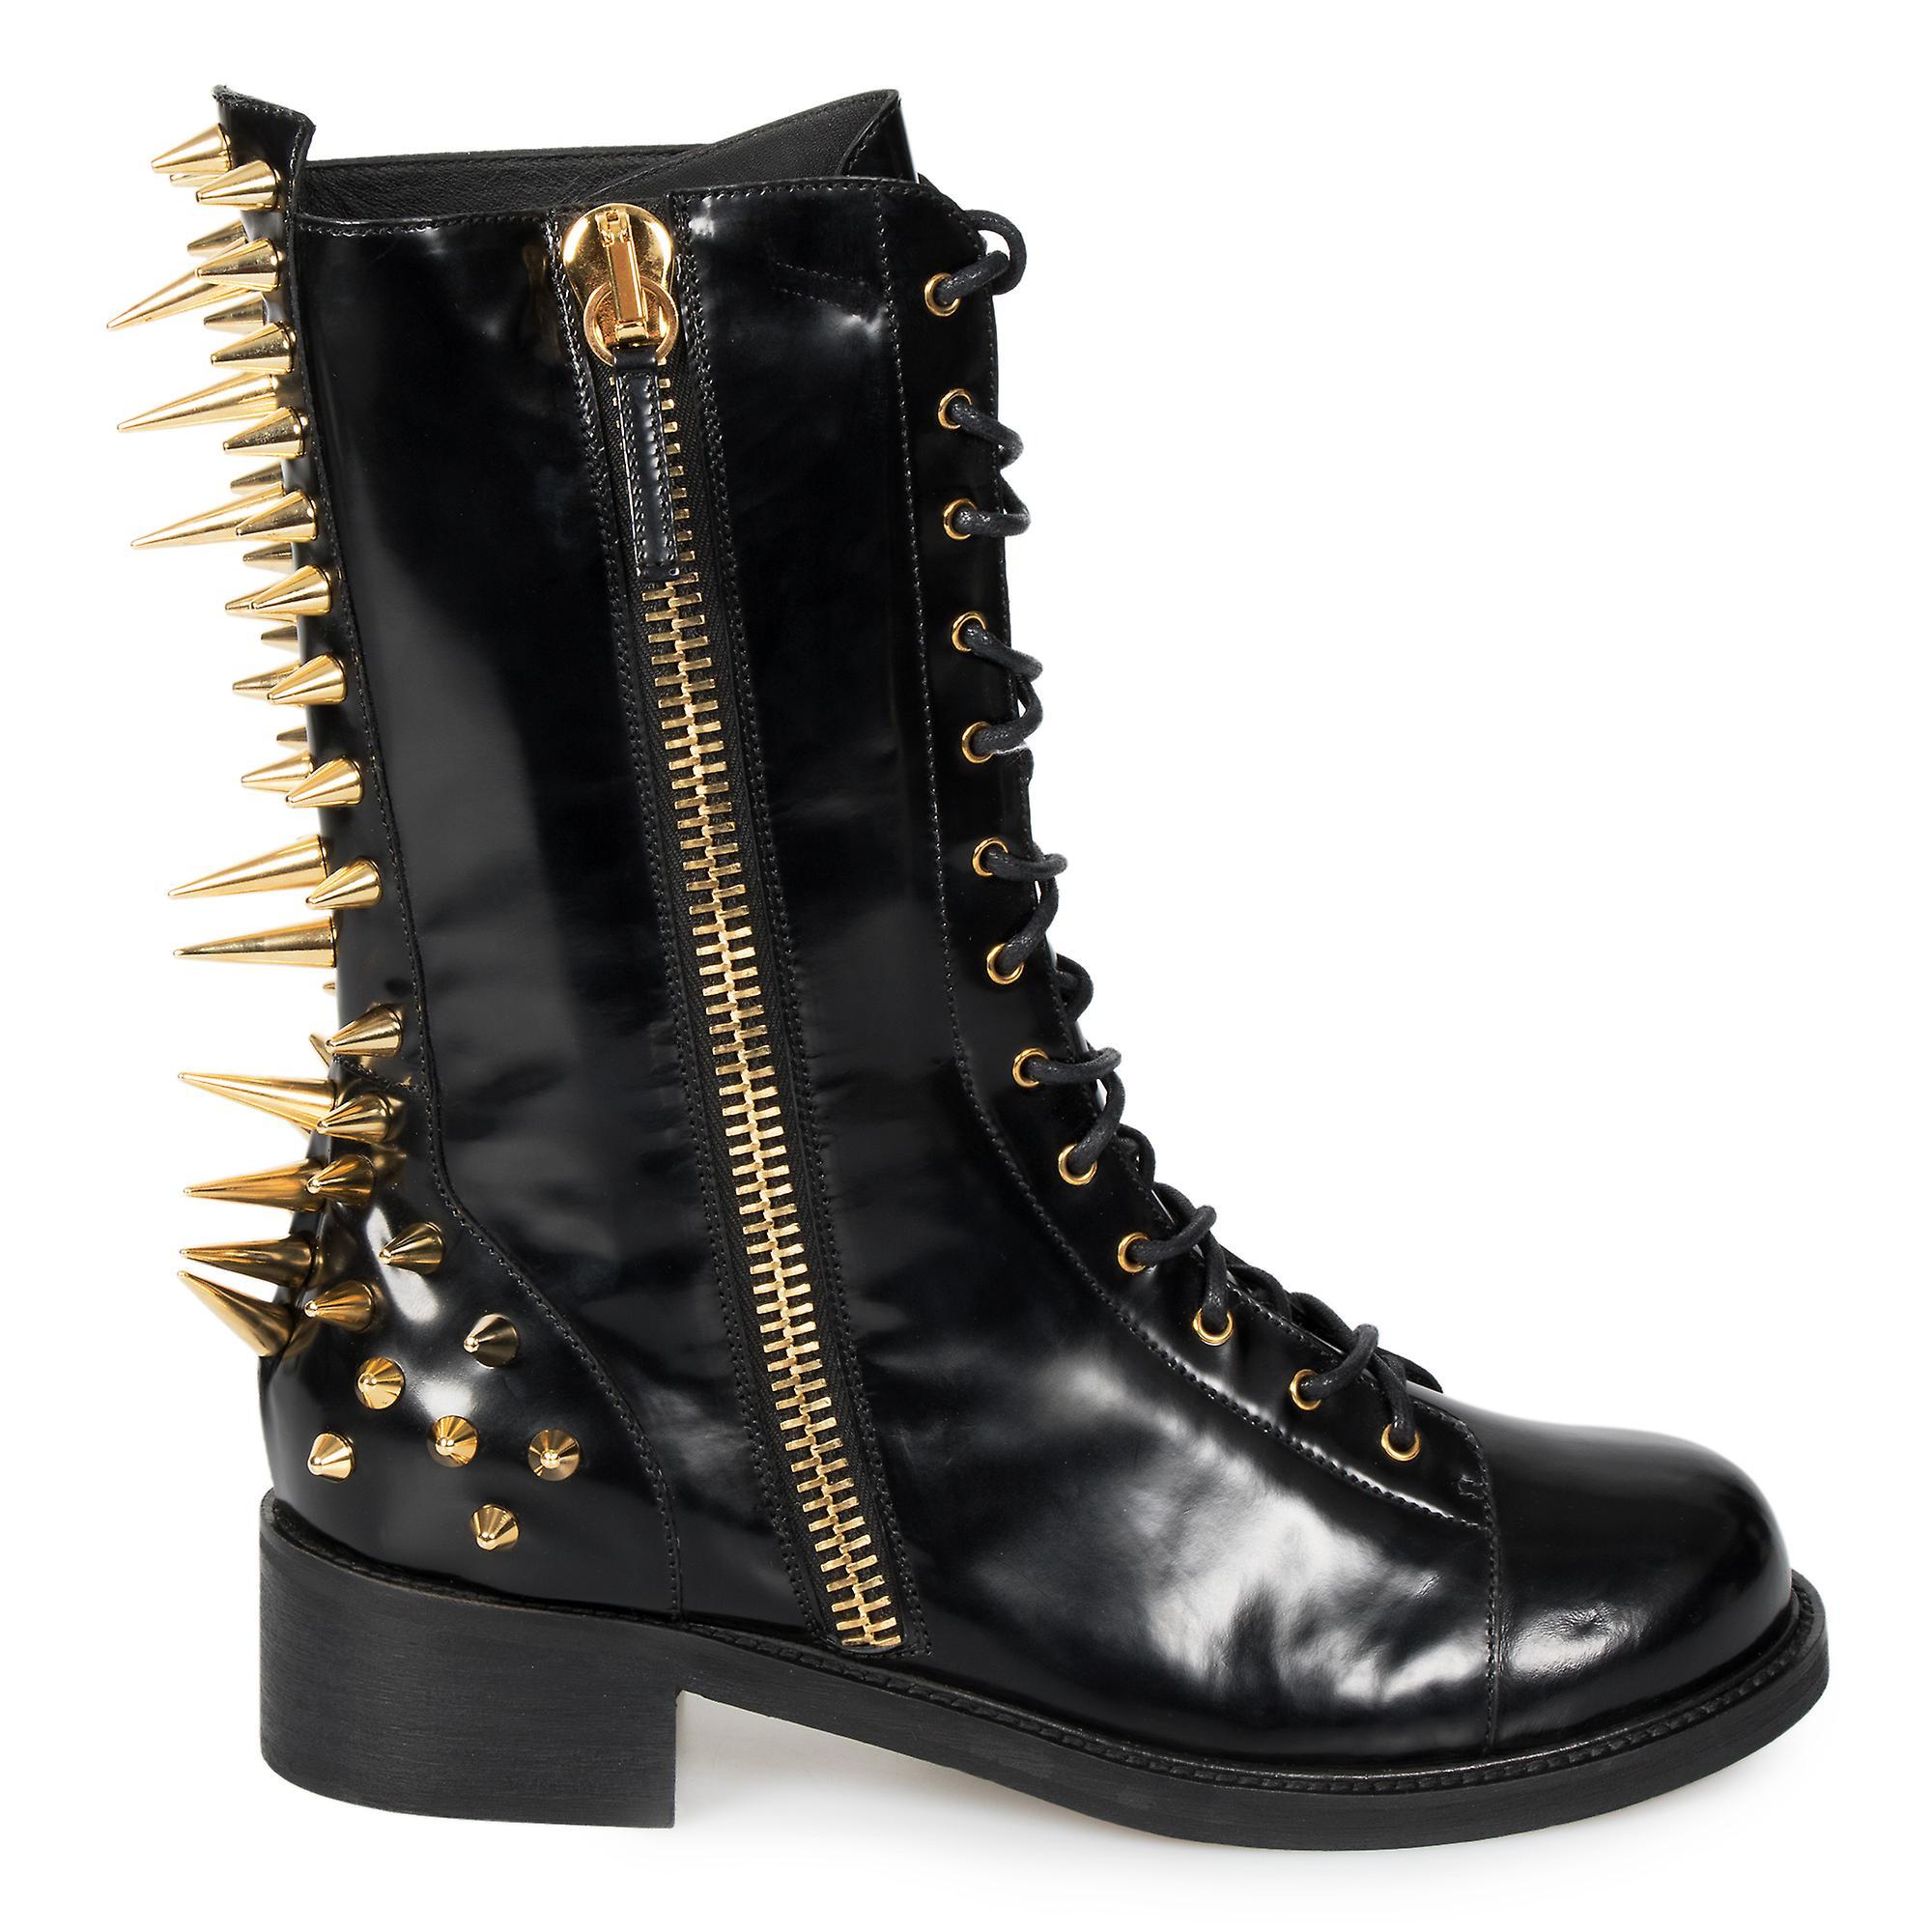 Giuseppe Zanotti Blok Spiked Military Black Patent Leather Boots